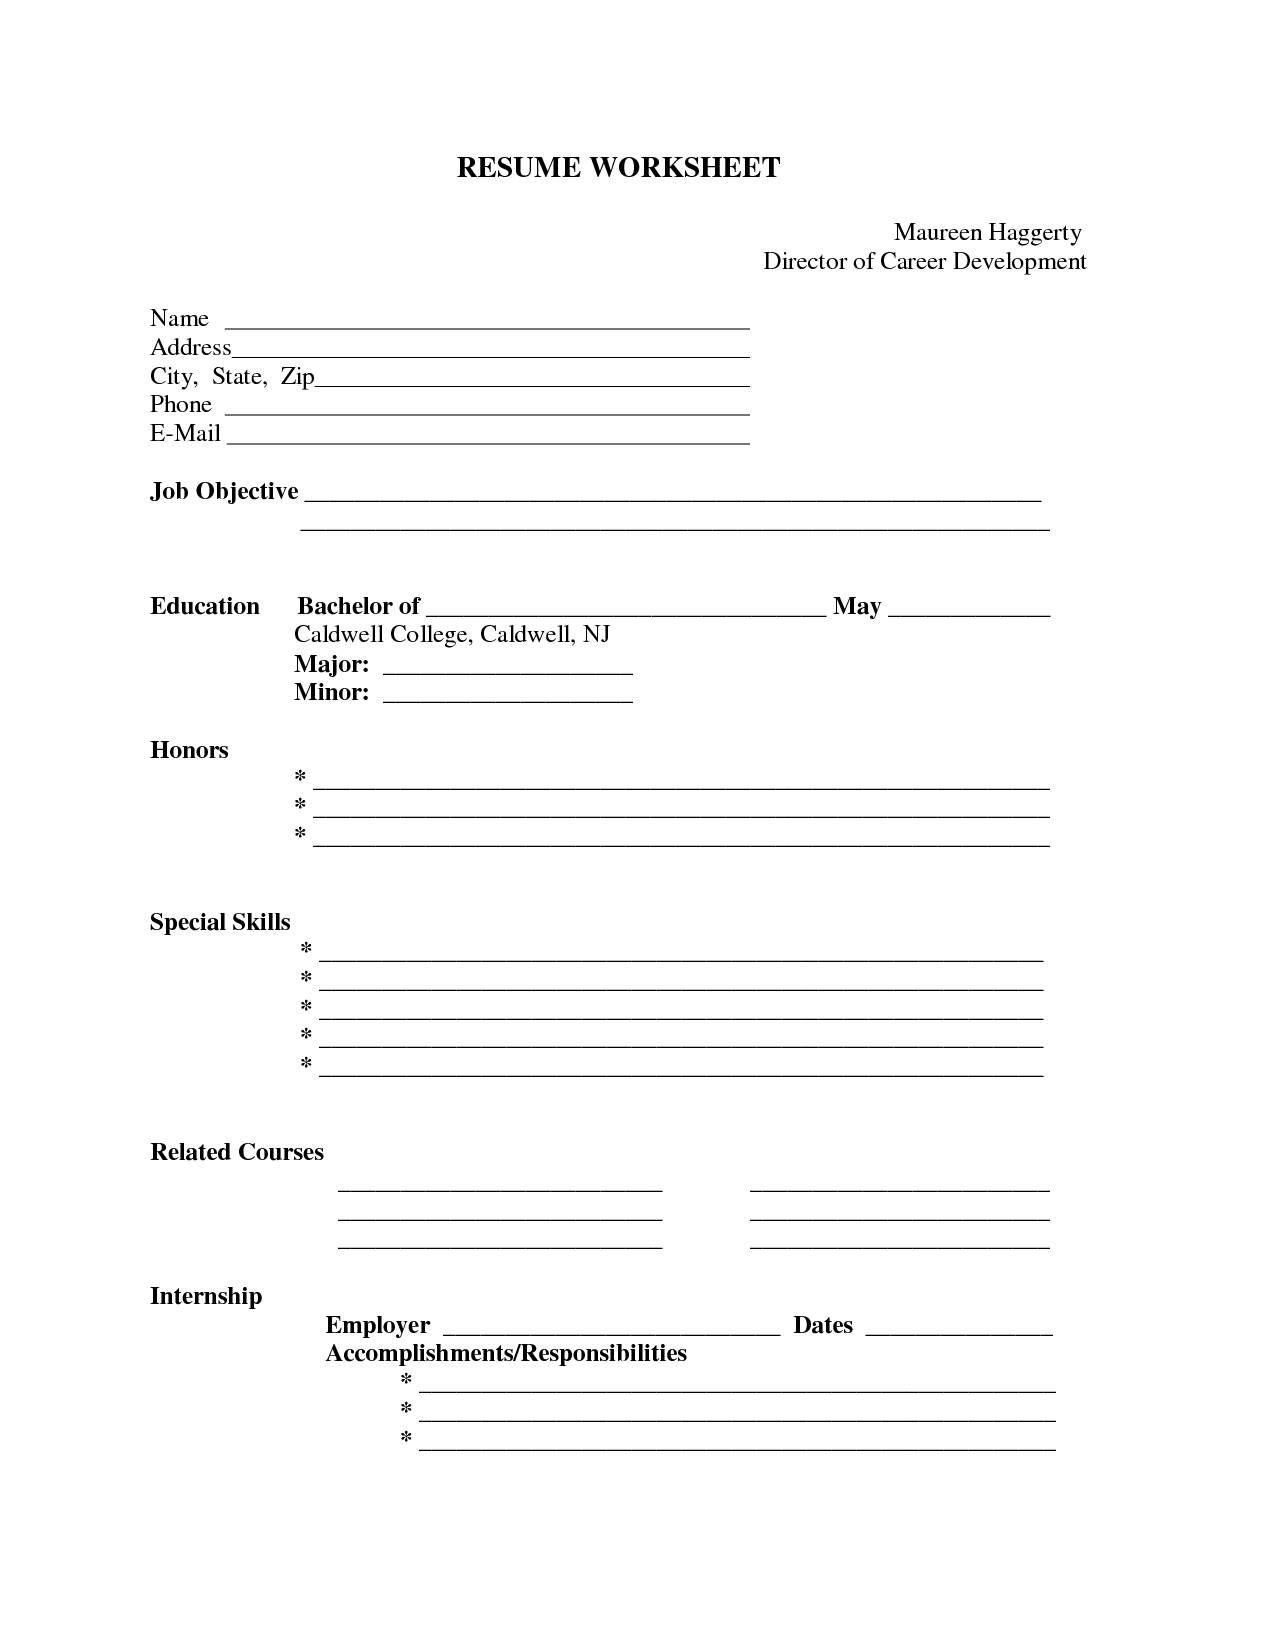 Resume Format Blank